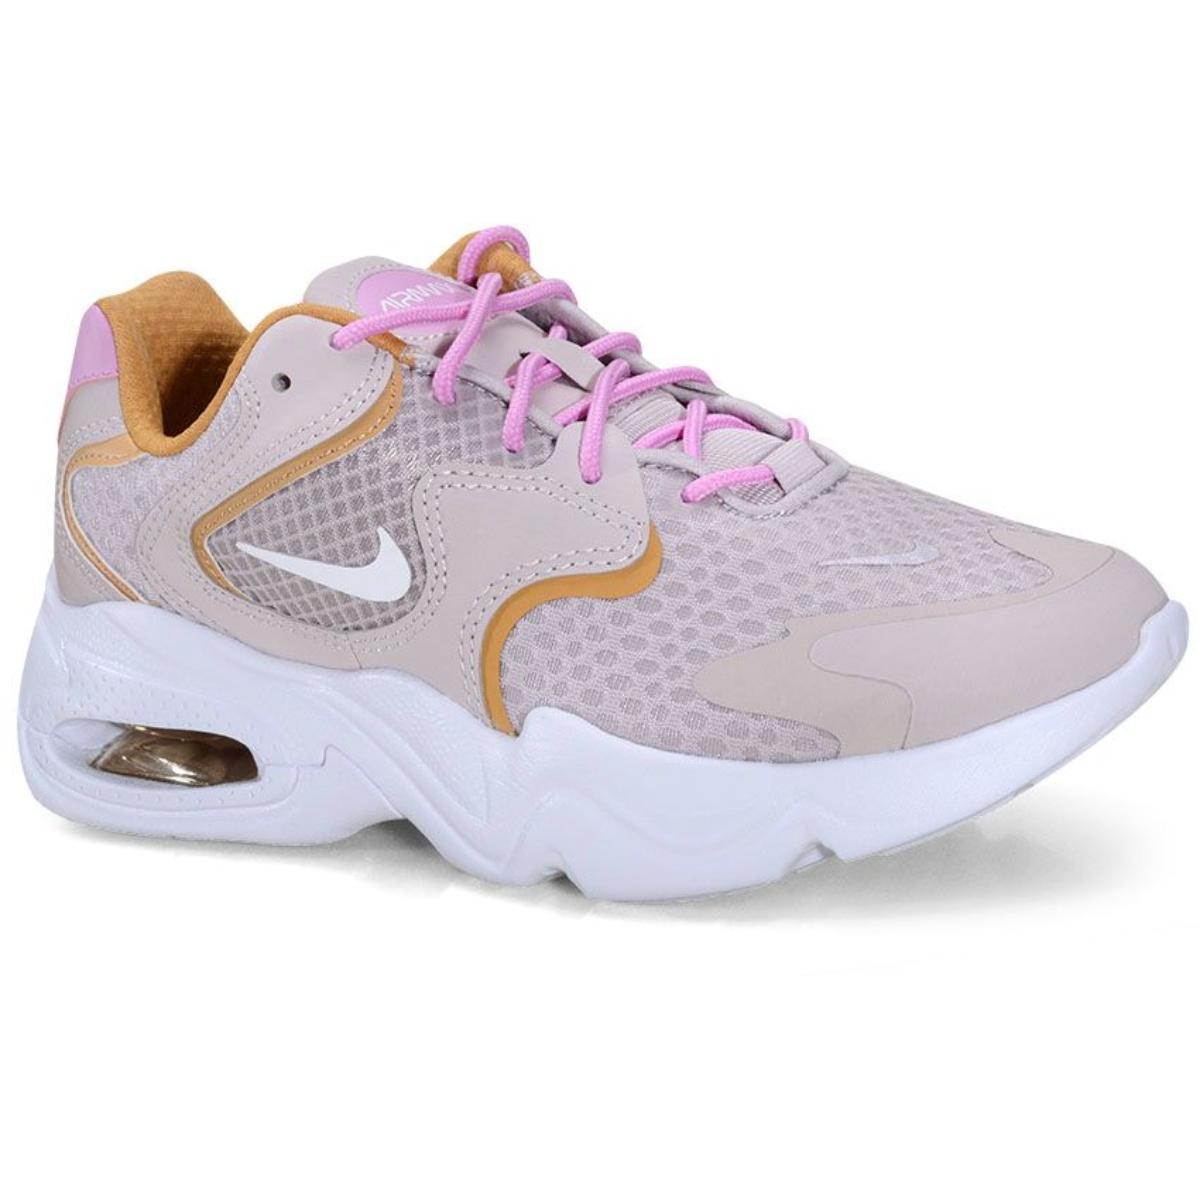 Tênis Feminino Nike Ck2947-003 Air Max Advatange 4 Rose/lilas